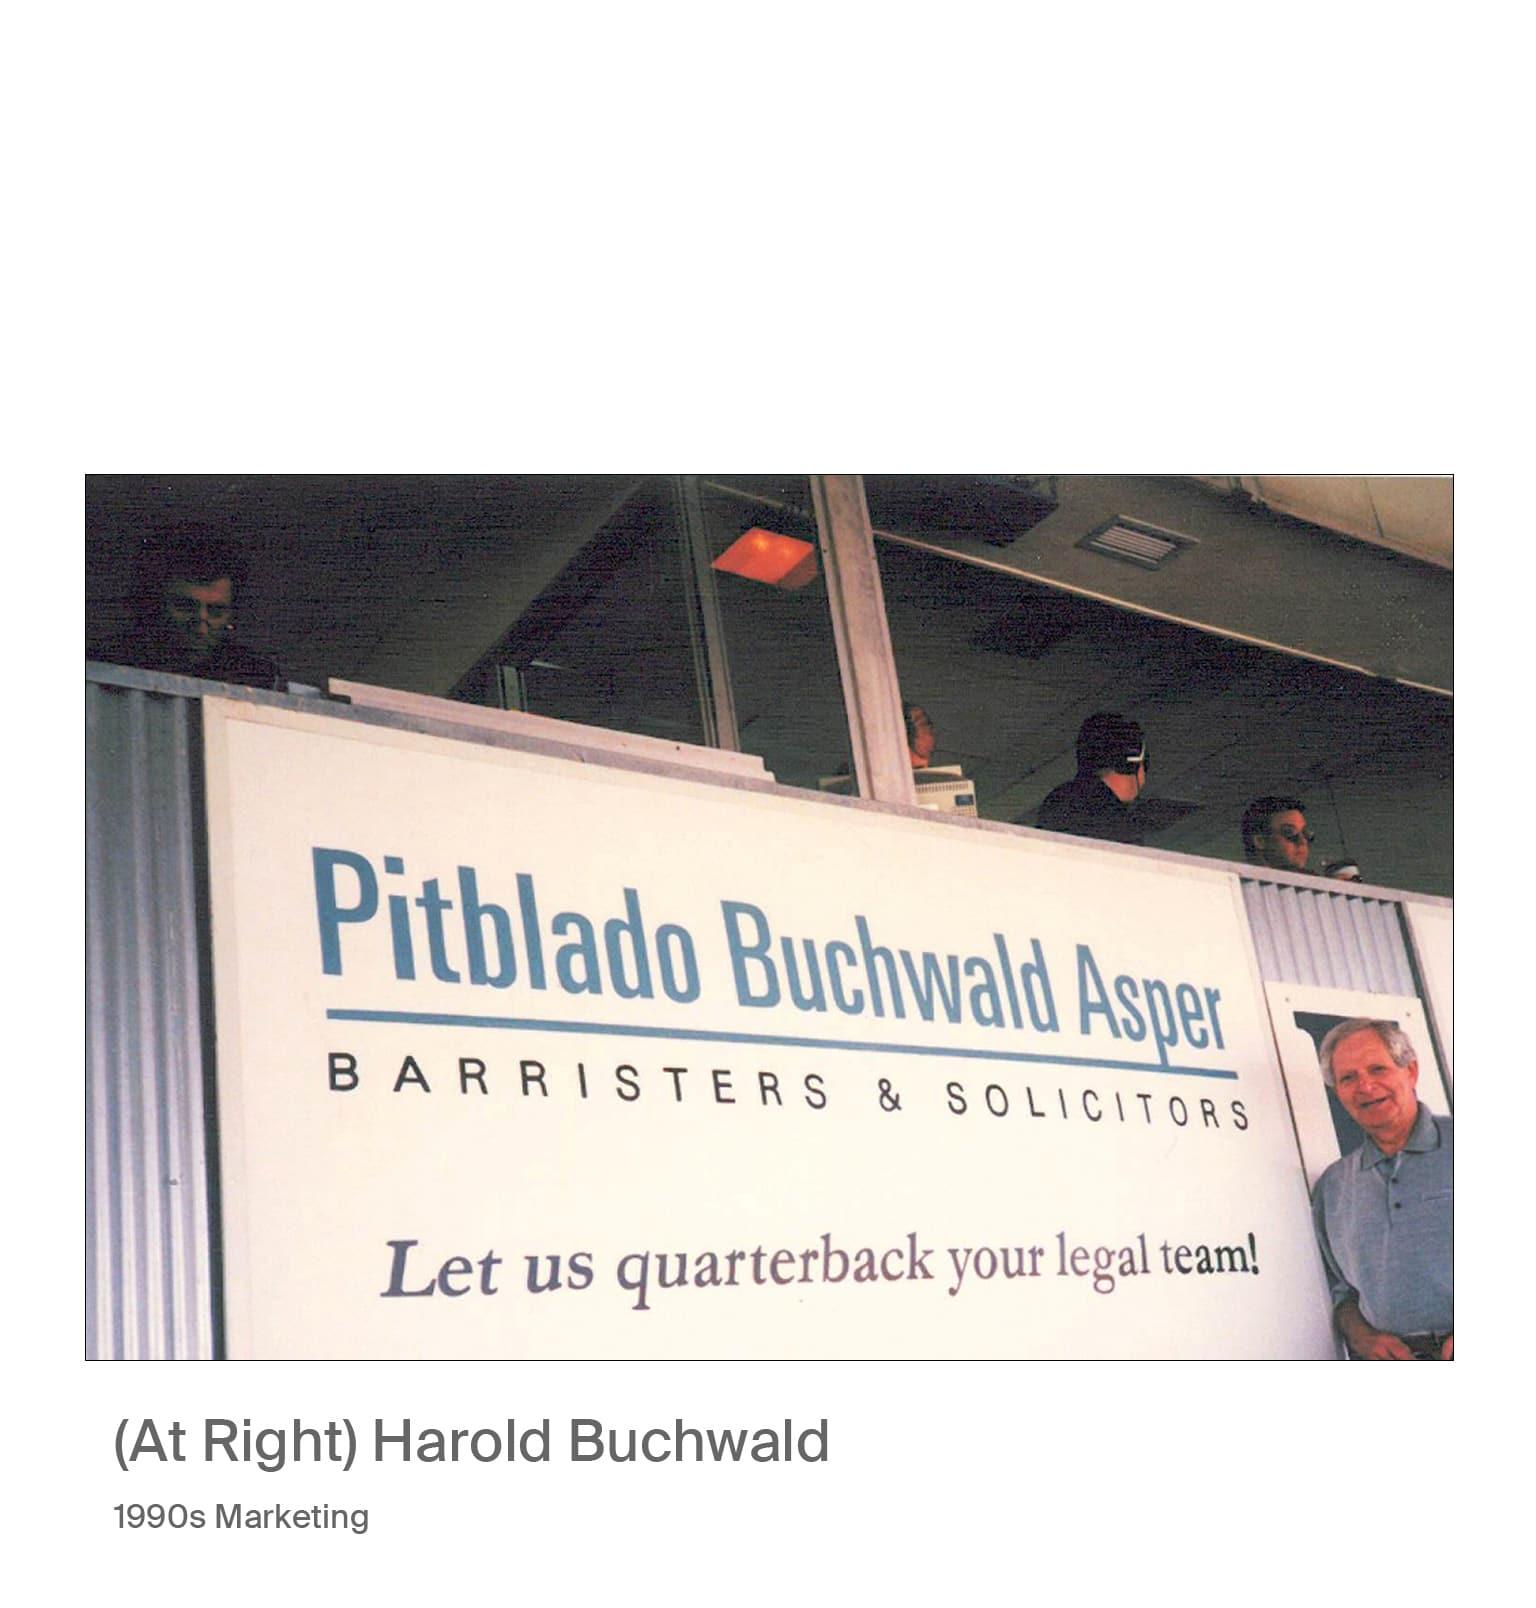 Harold Buchwalk 1990s marketing image.